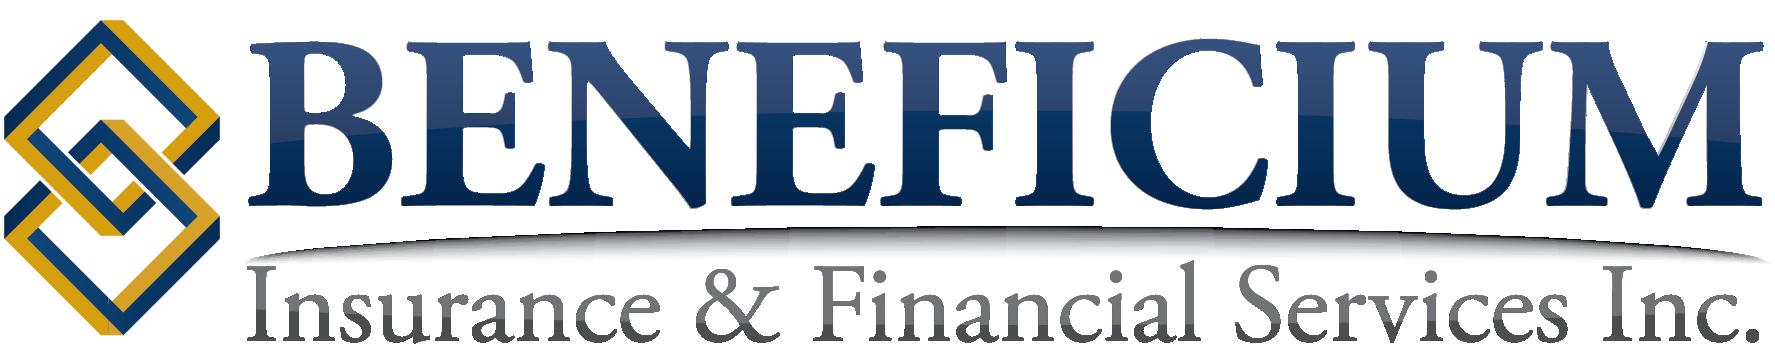 Logo for Beneficium Insurance & Financial Services | Ottawa